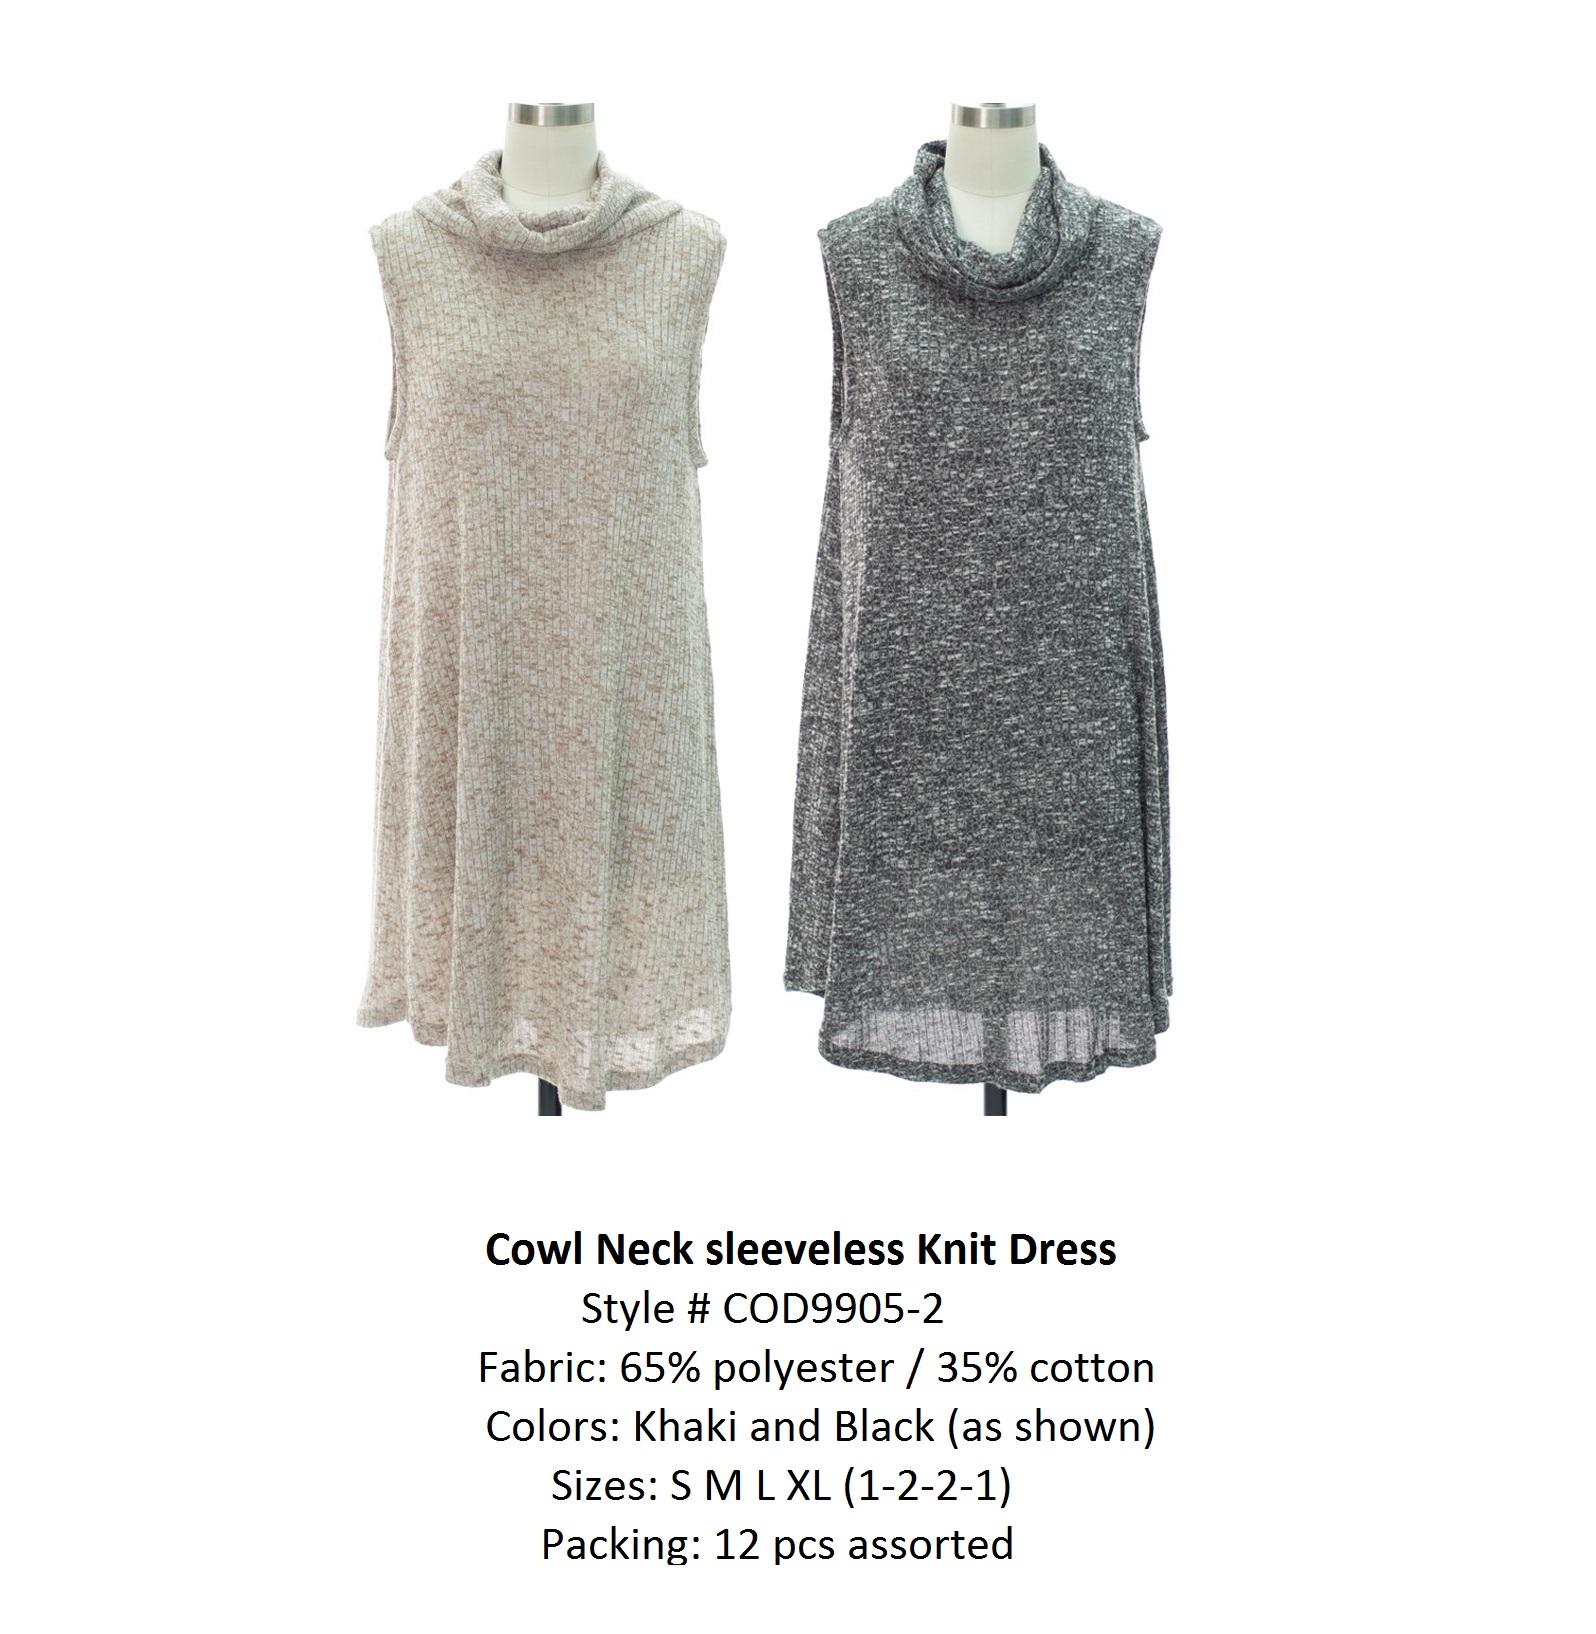 COD9905-2